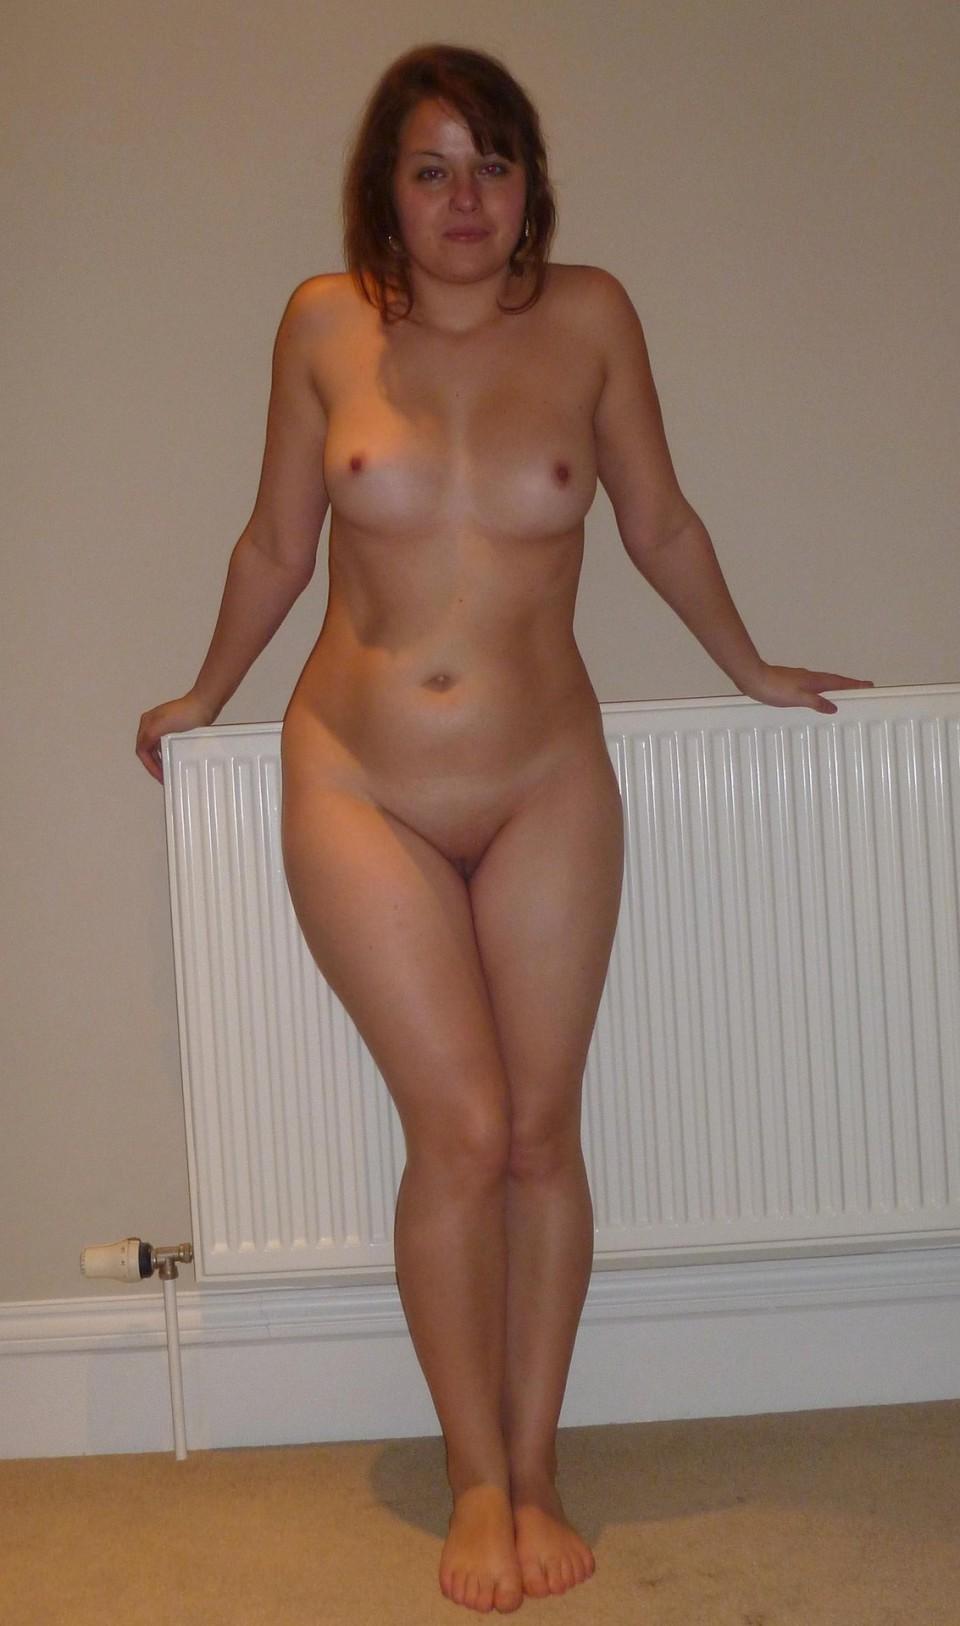 tumblr nude men and women